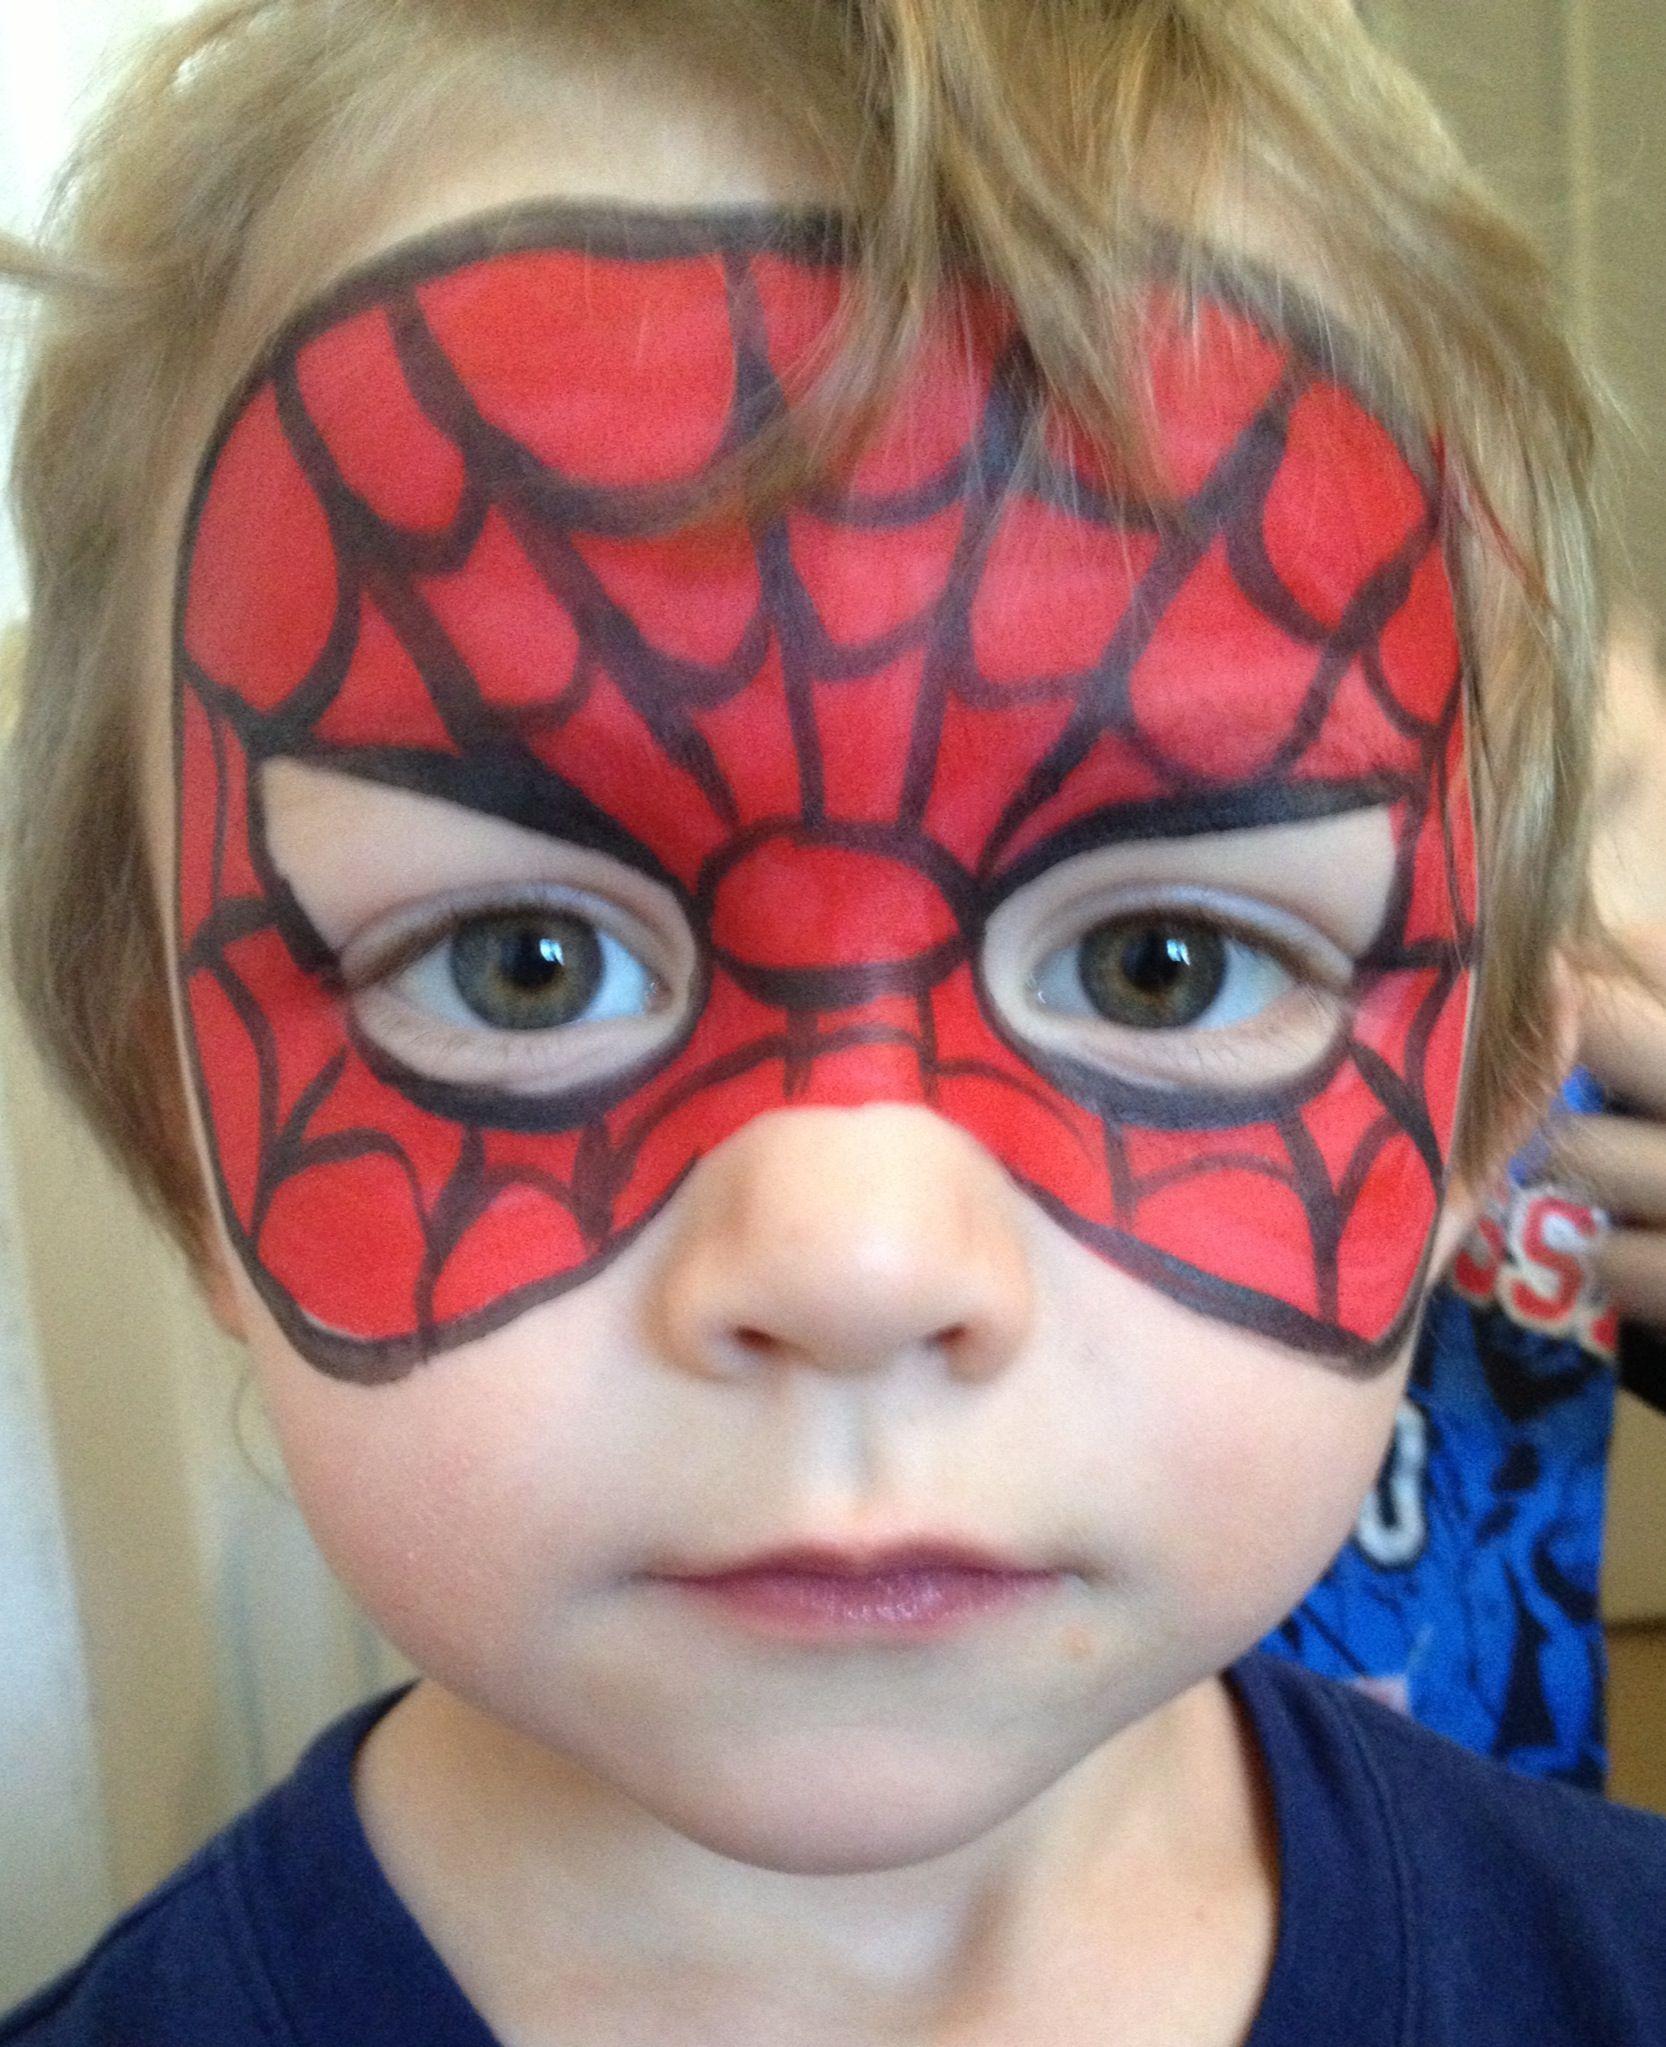 Pin By Mehmet Karaburun On Face Painting By Jennifer Vandyke Face Painting Halloween Superhero Face Painting Spiderman Face